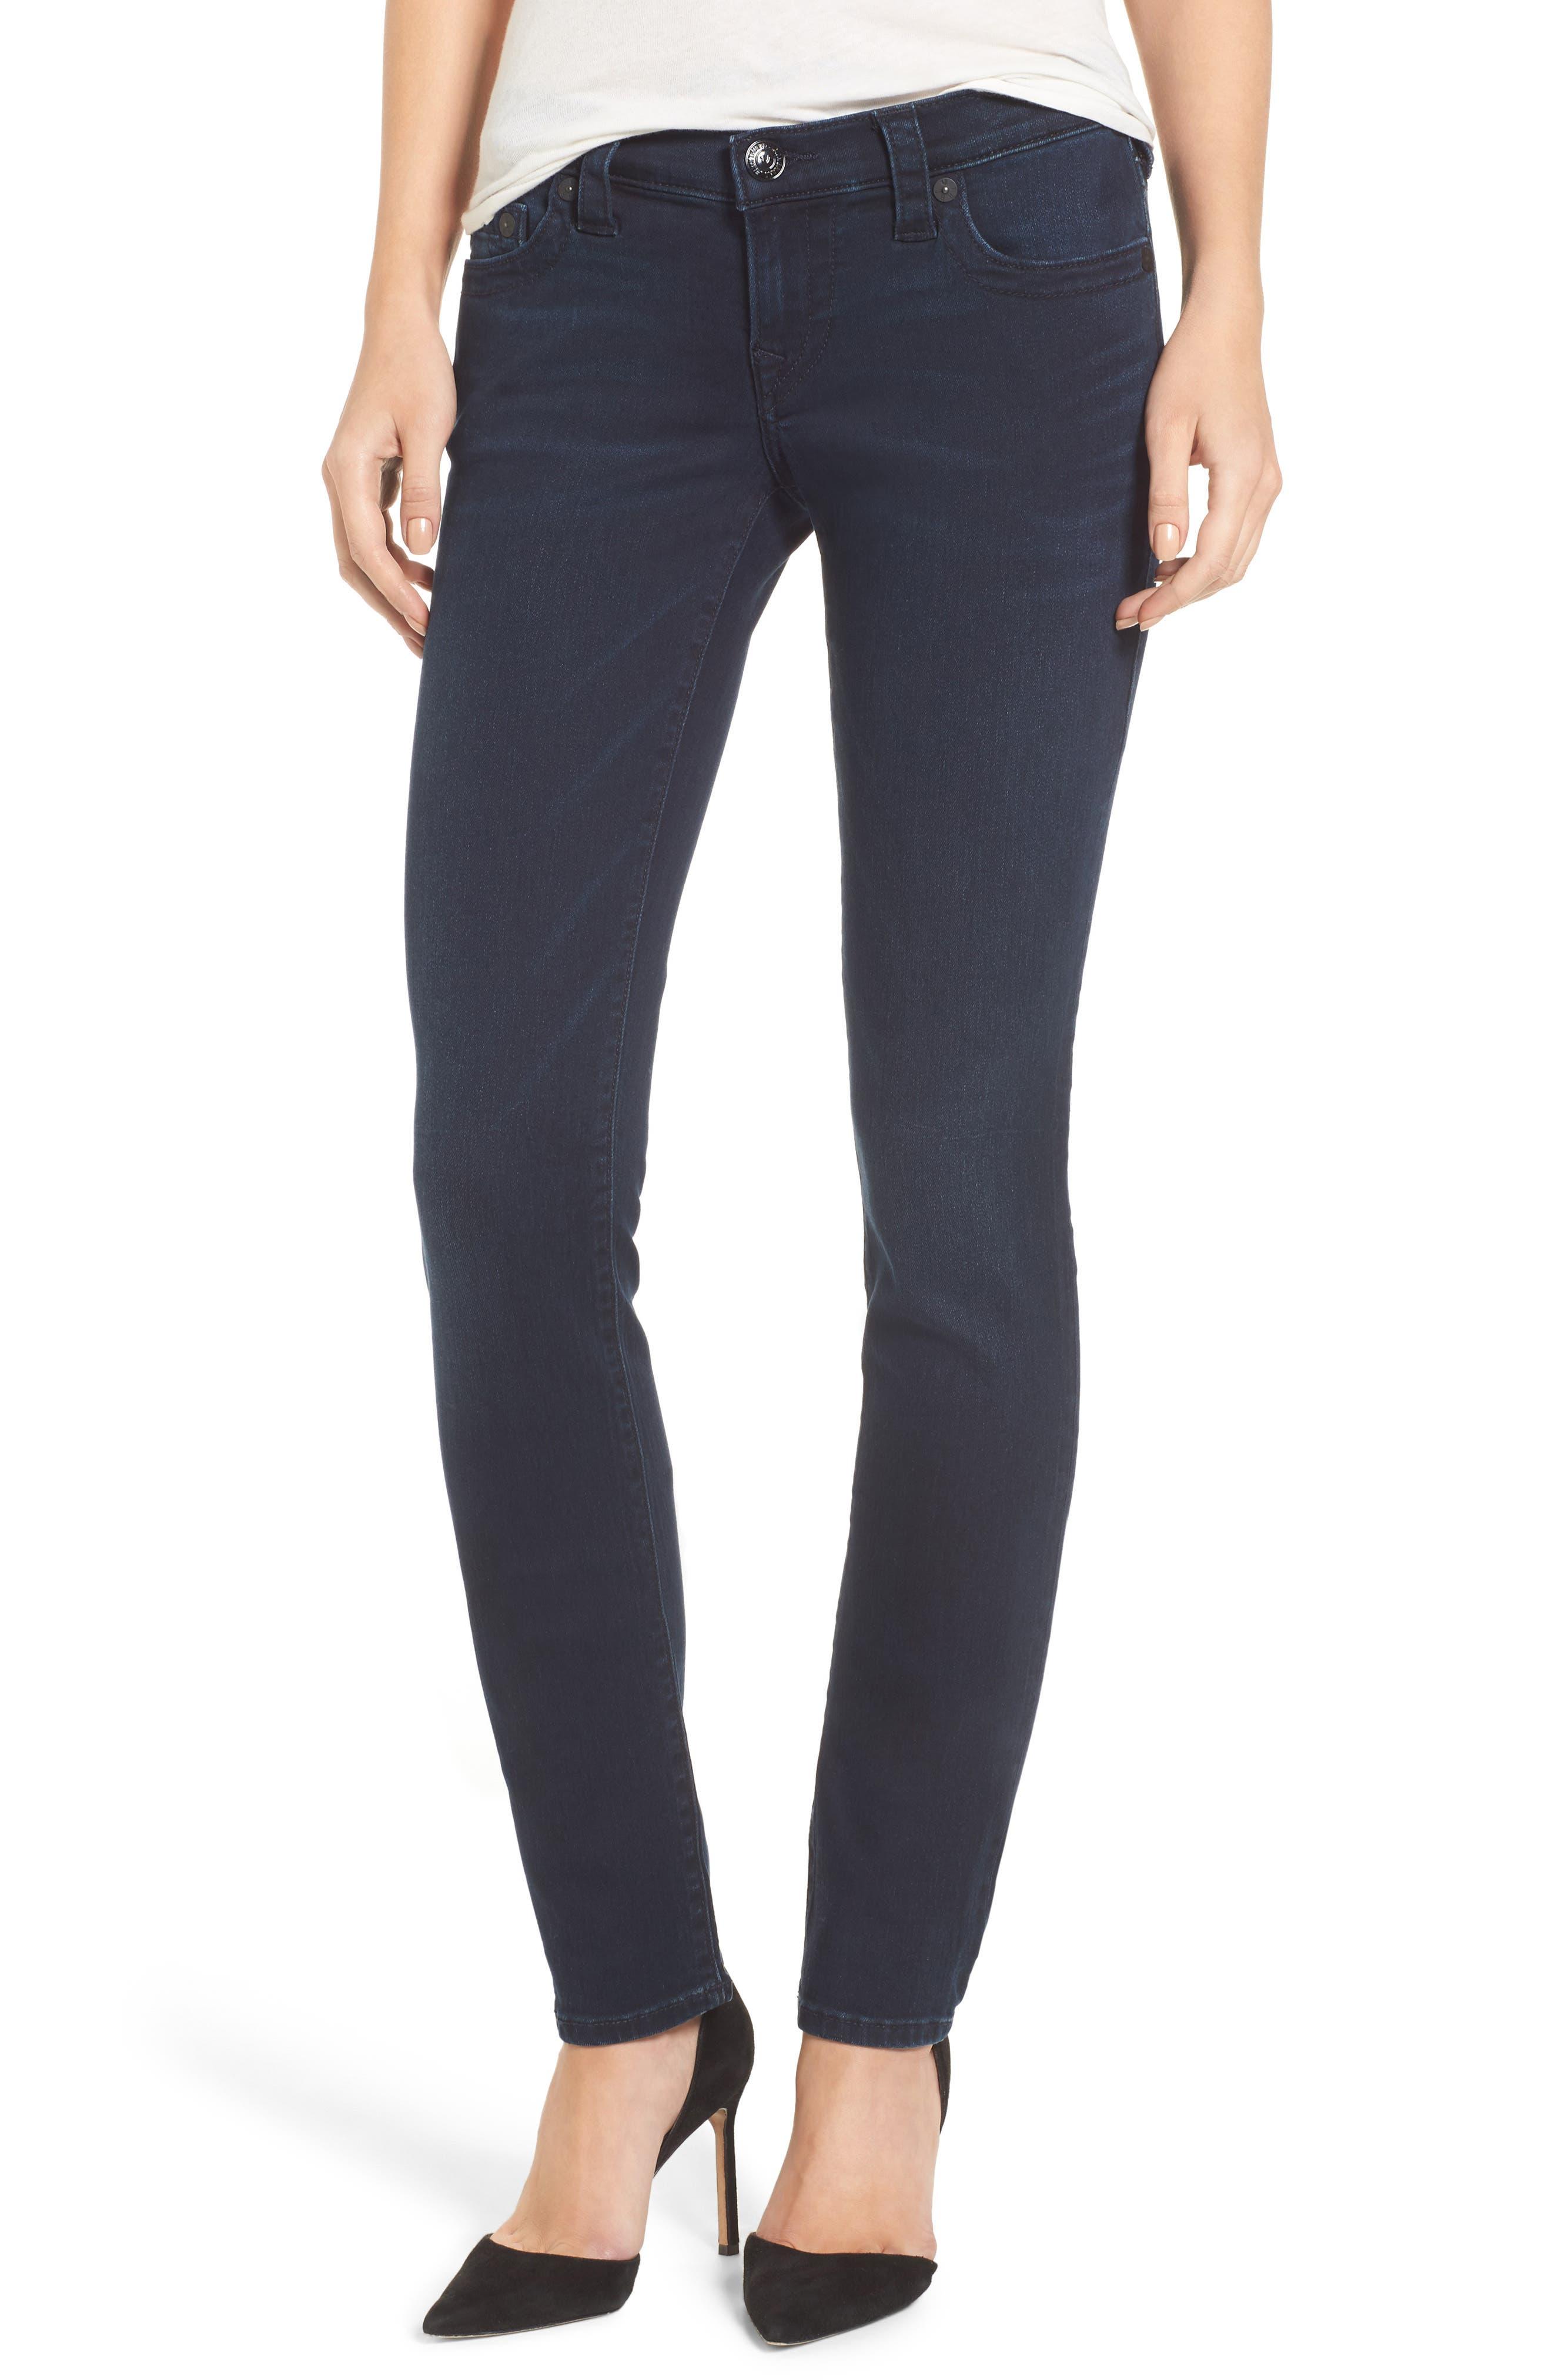 True Religion Brand Jeans Stella Low Rise Skinny Jeans (Mystic Blues)